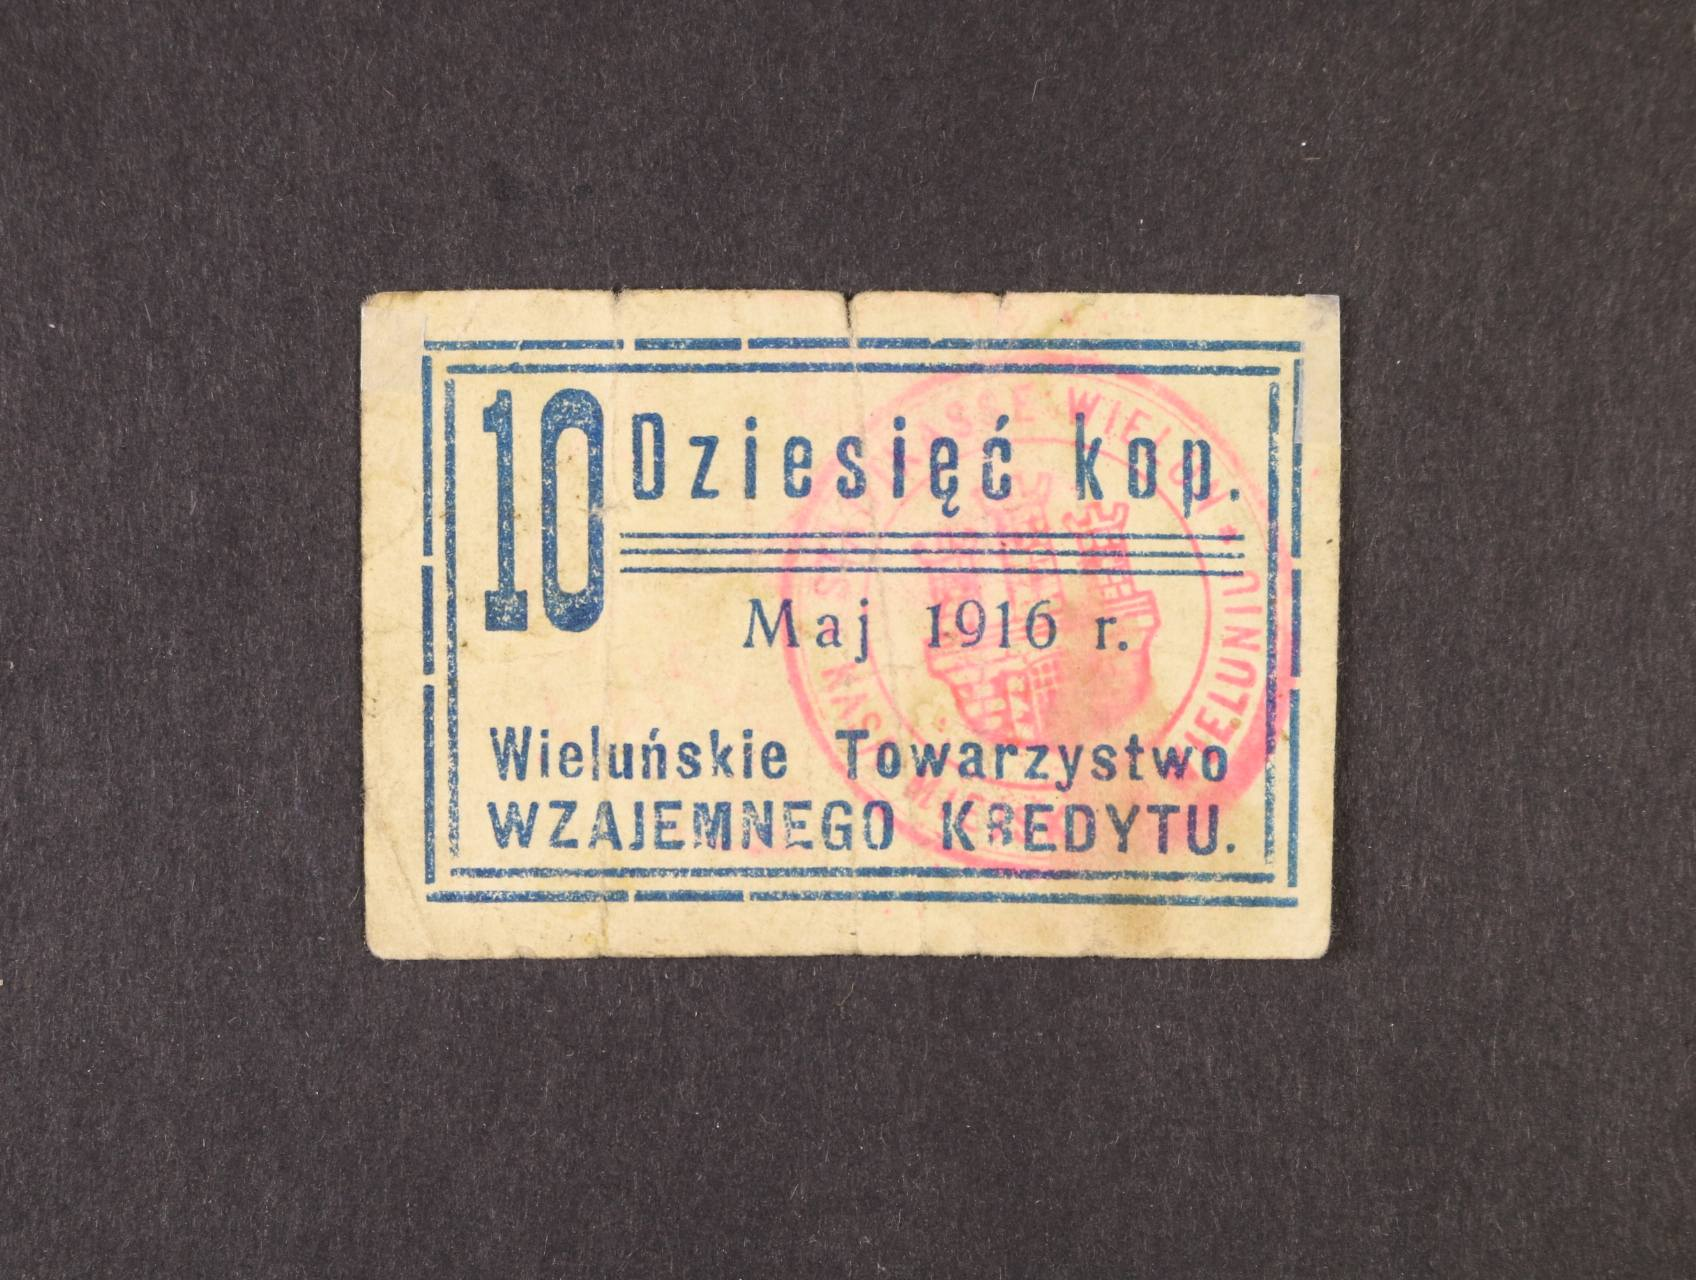 Wielun, 10 kop. 5.1916 Community of Mutual Credit, Rj. R-26766